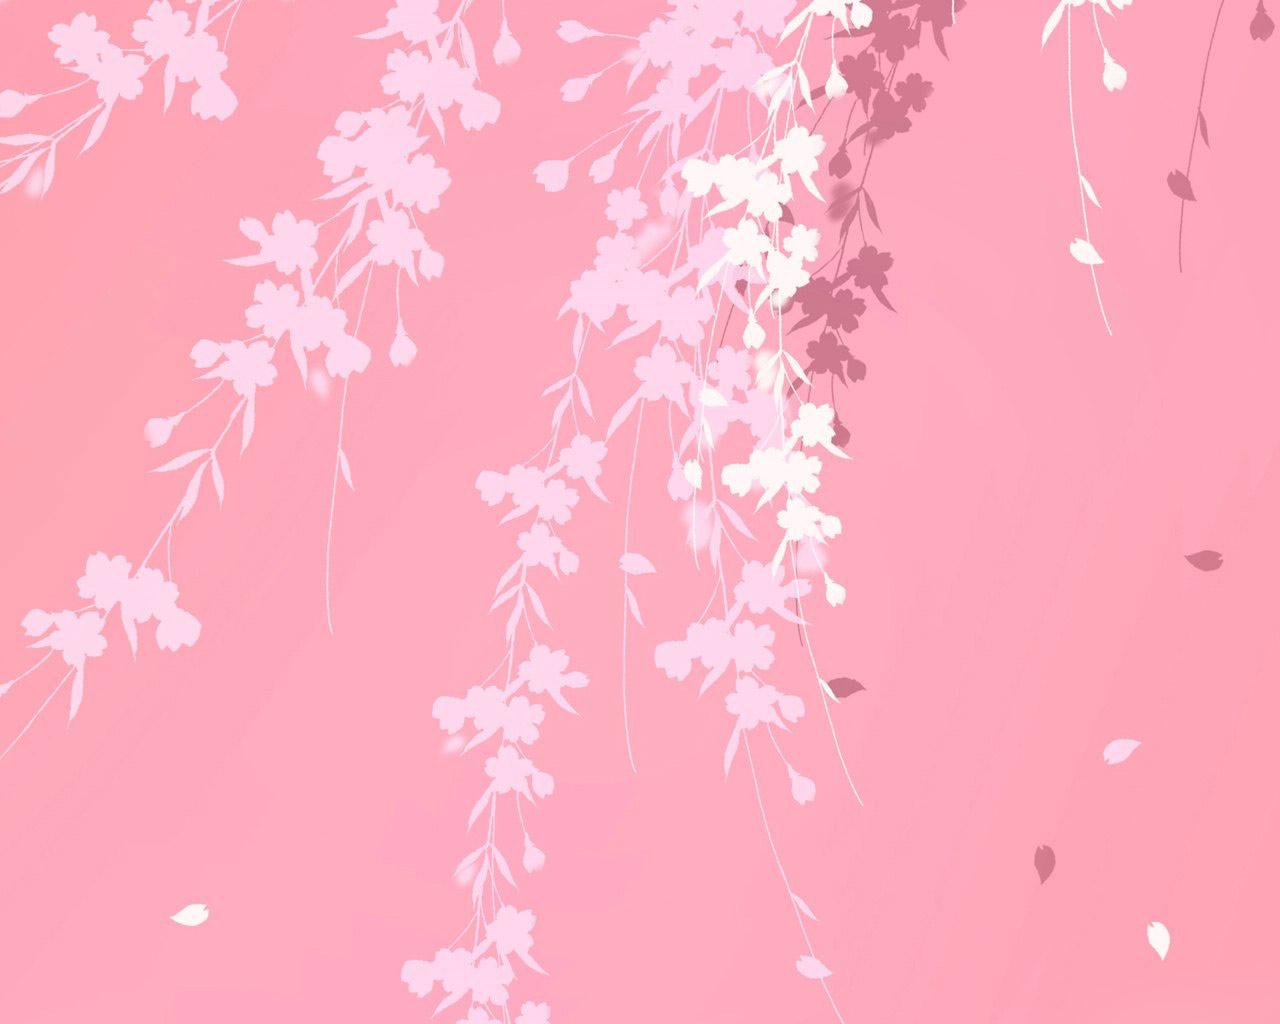 Pink background branches windows 7 Desktop Wallpaper 1280x1024